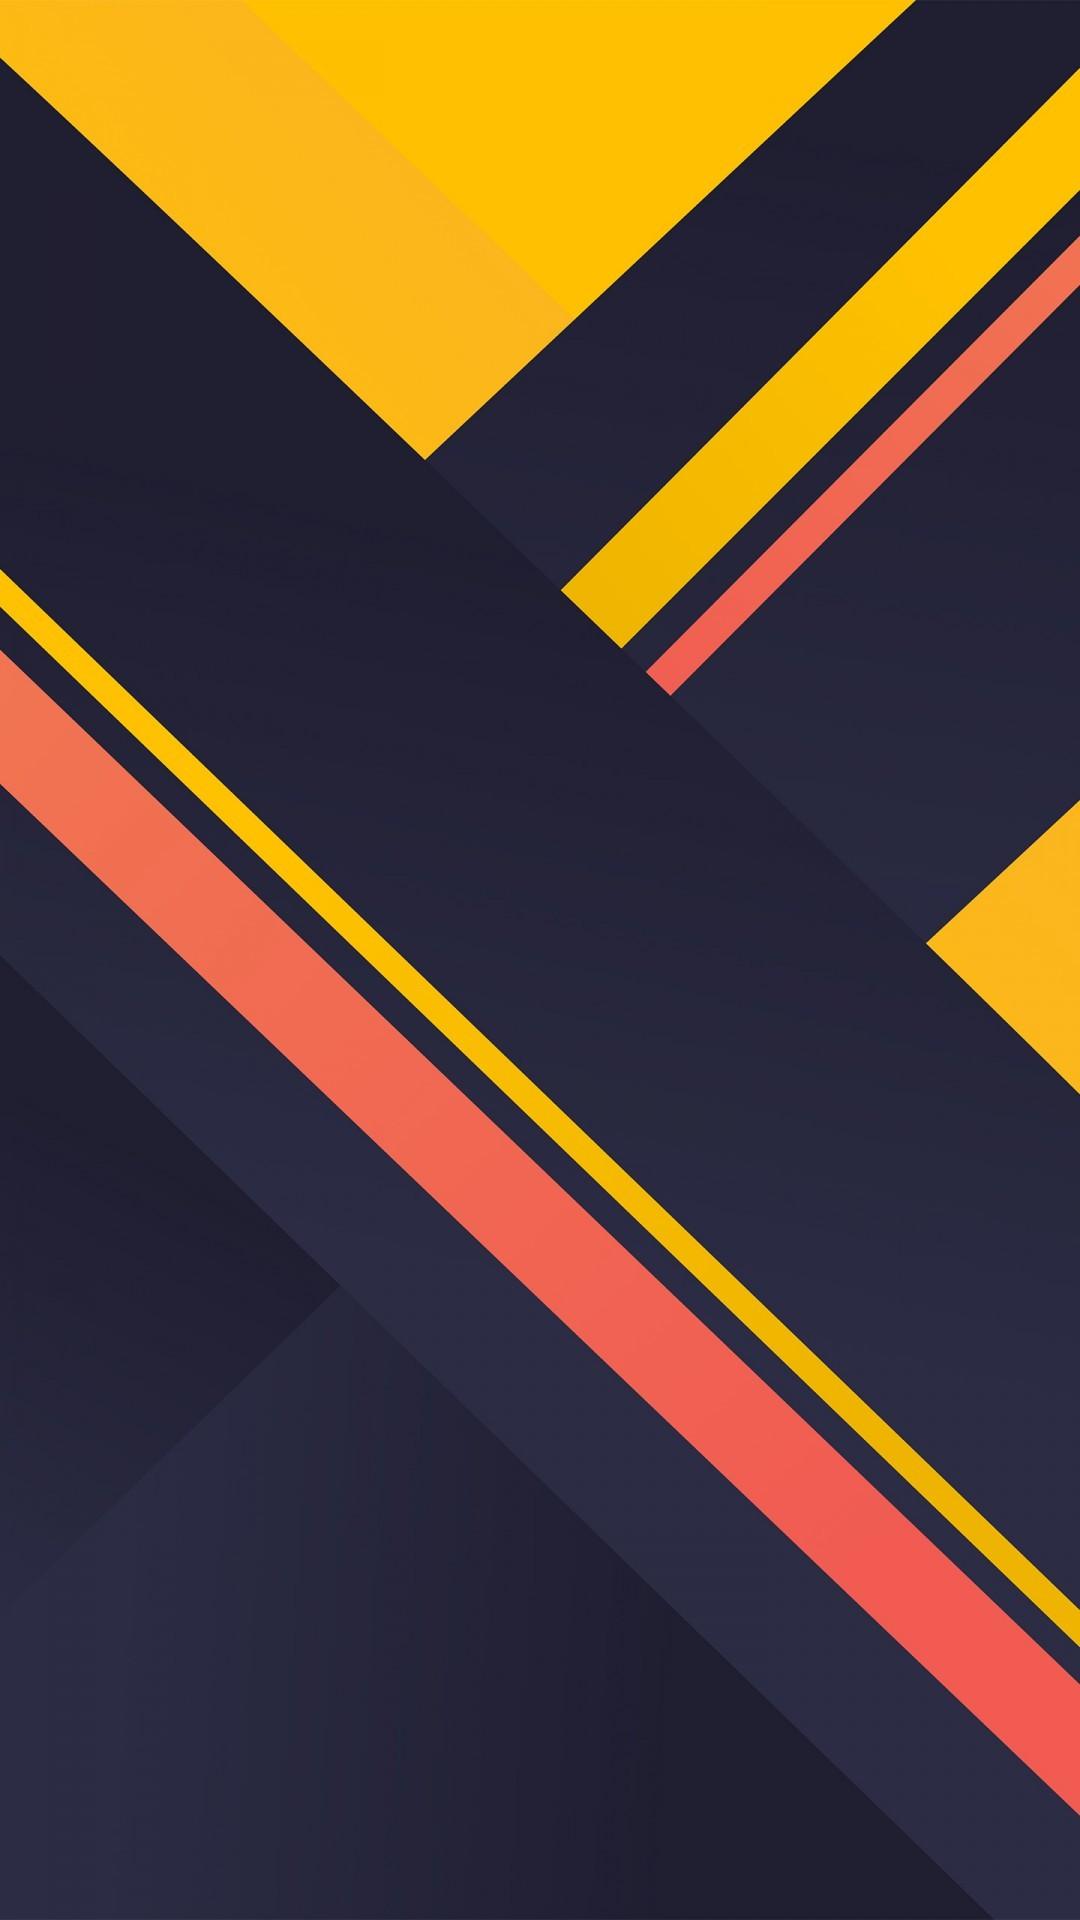 Free Yellow Stripes Material Design phone wallpaper by squarebush